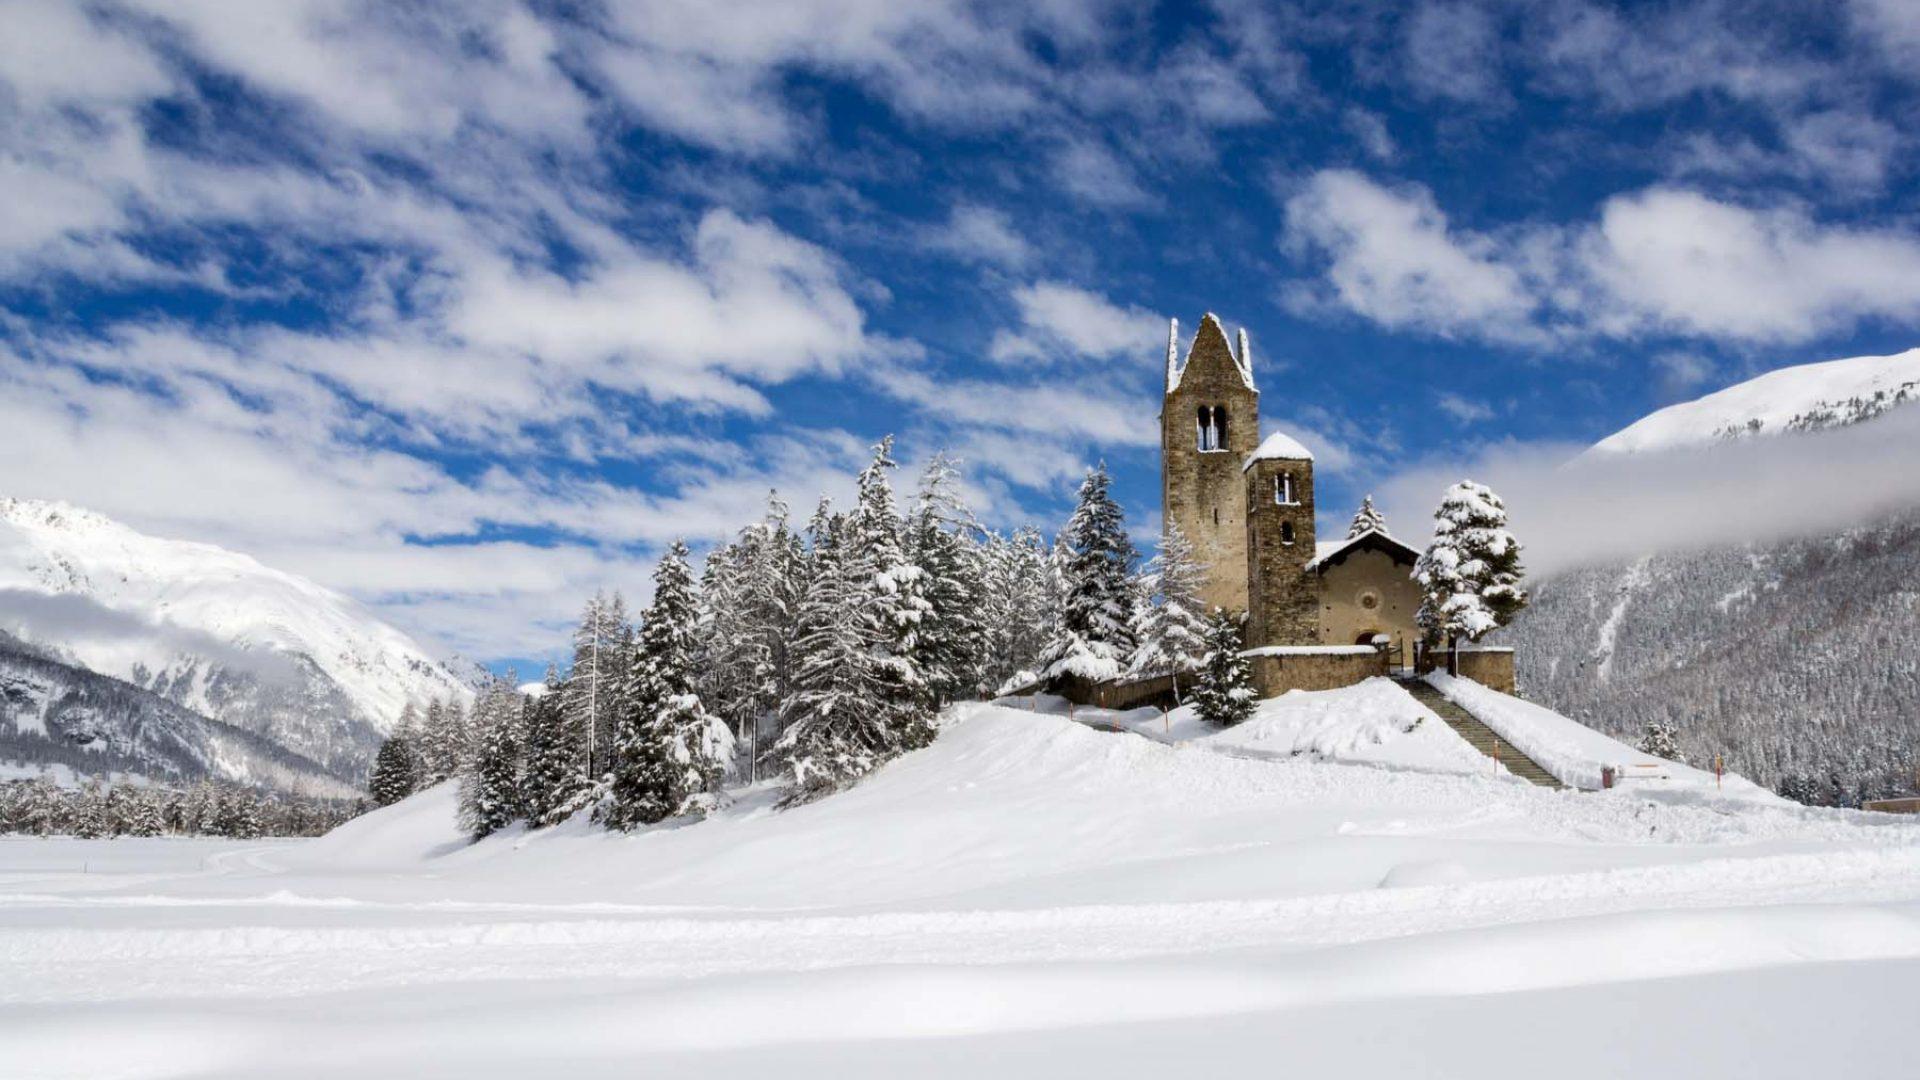 Religion in Switzerland